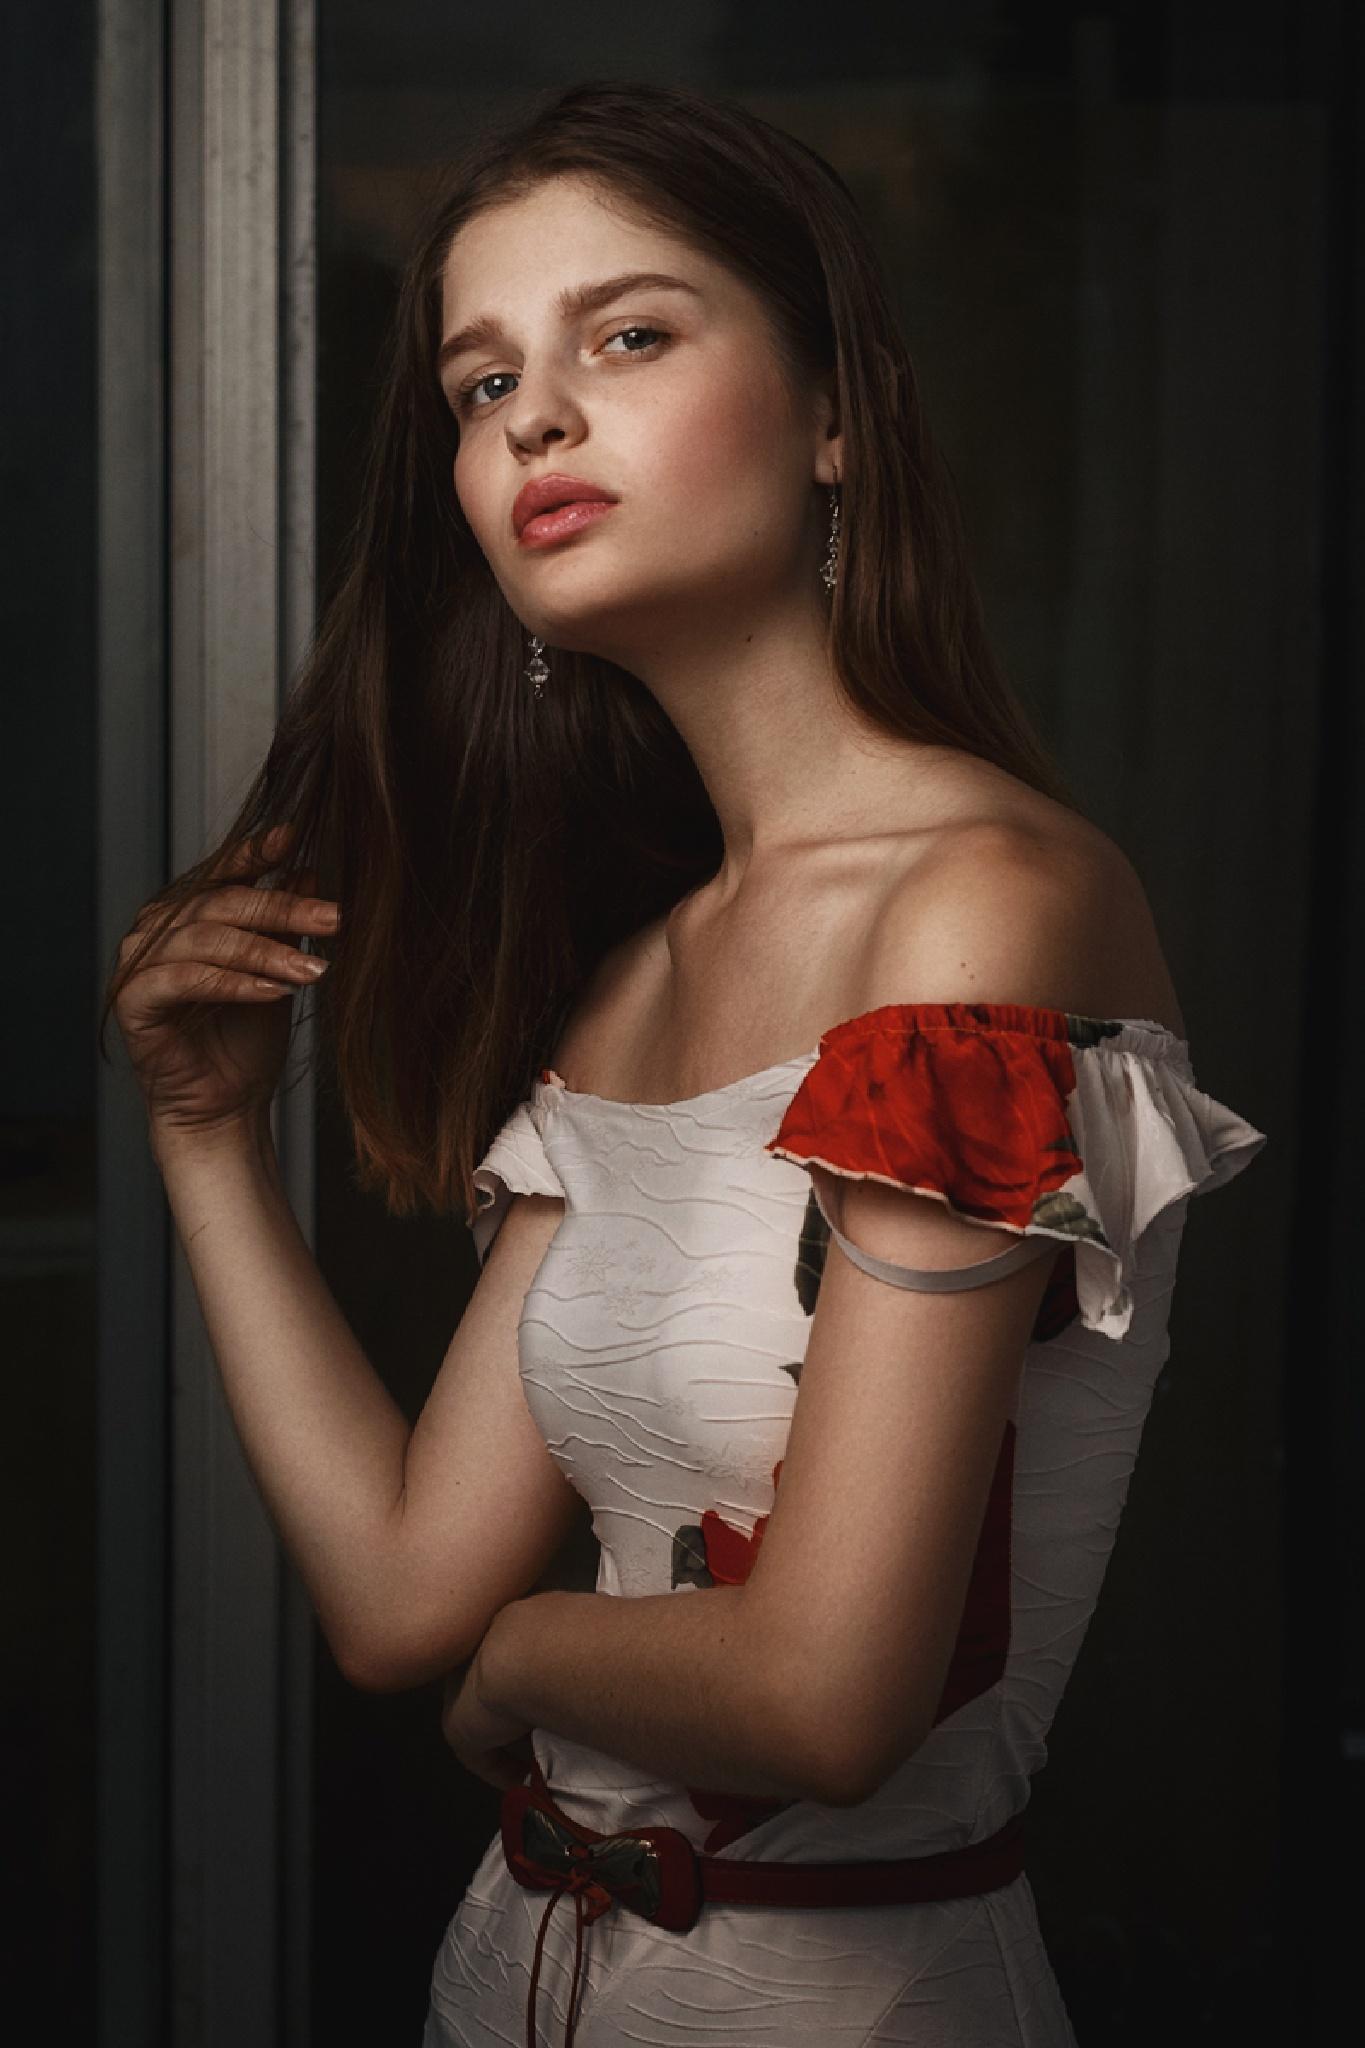 Jeanne by Ivan Kopchenov